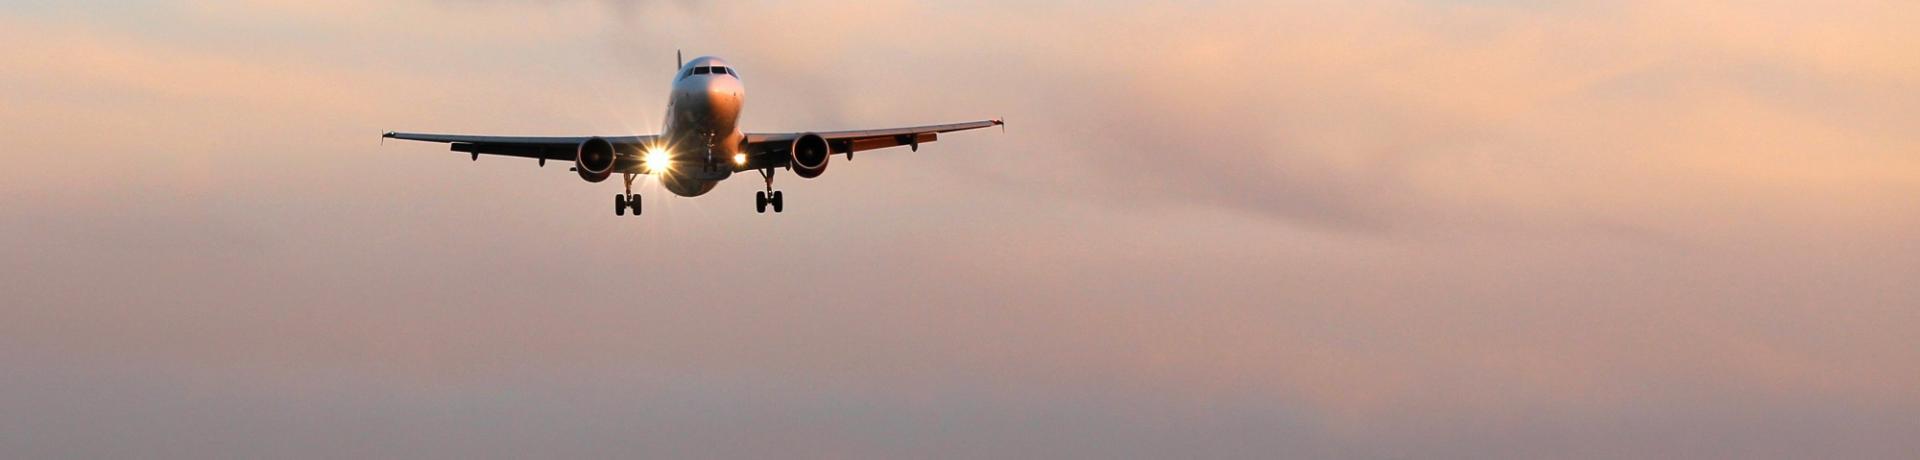 Flugzeug-Abend-Emotion_GI-637362468.jpg